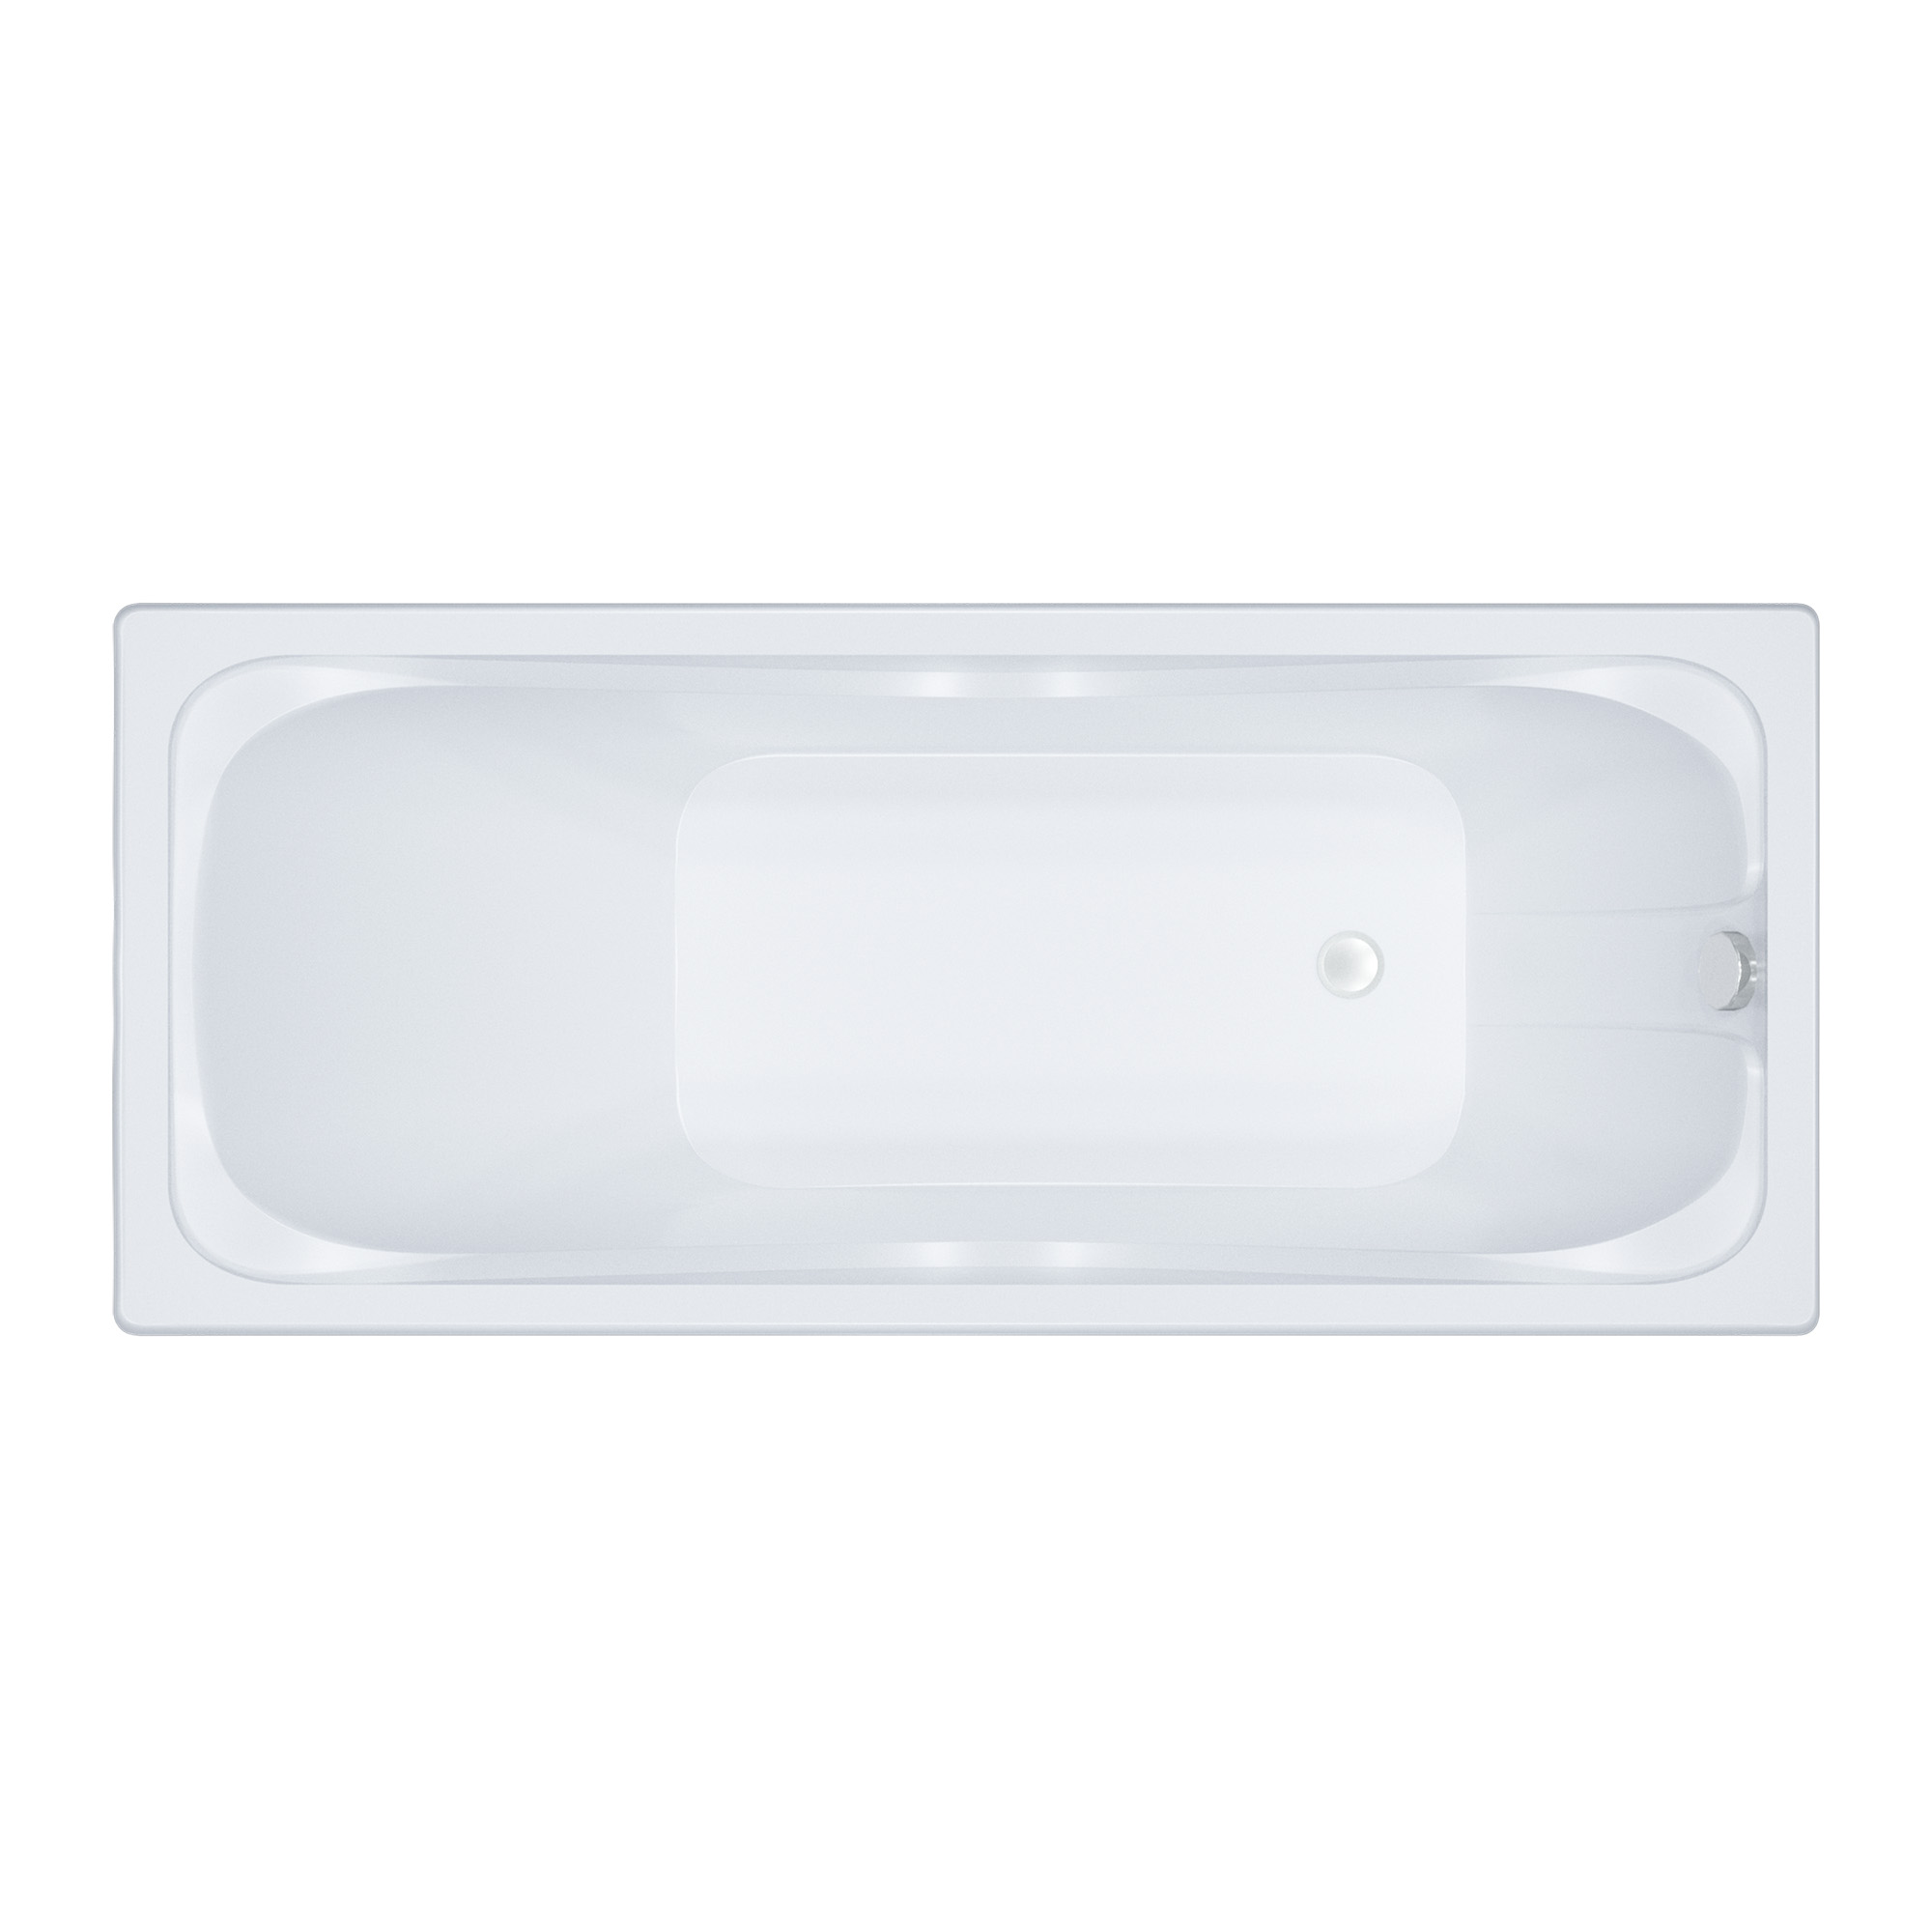 Акриловая ванна Тритон Стандарт 160 экран для ванны triton стандарт 120